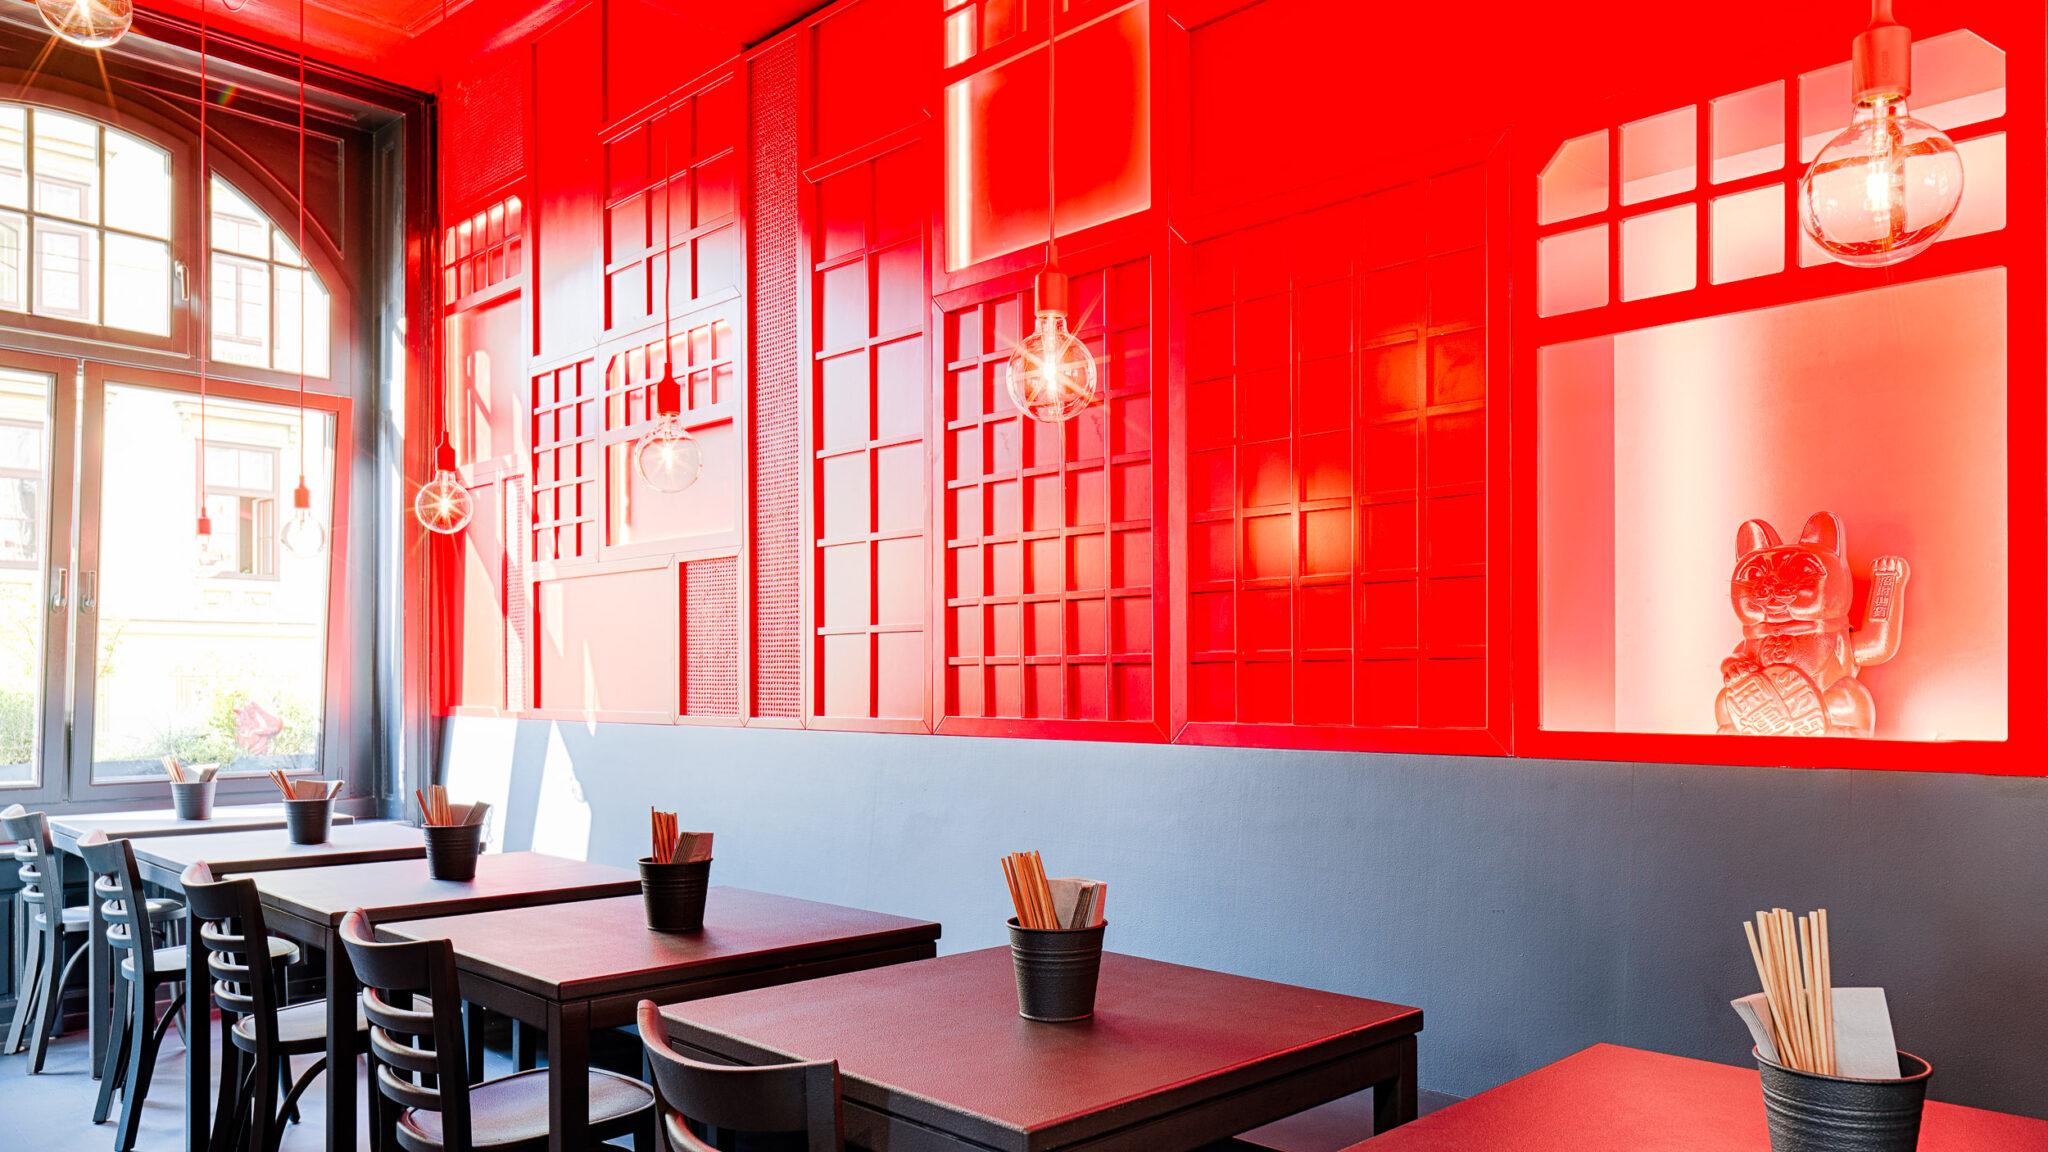 peter podpera reportage photography china bar wien pp 150810 015 hdr